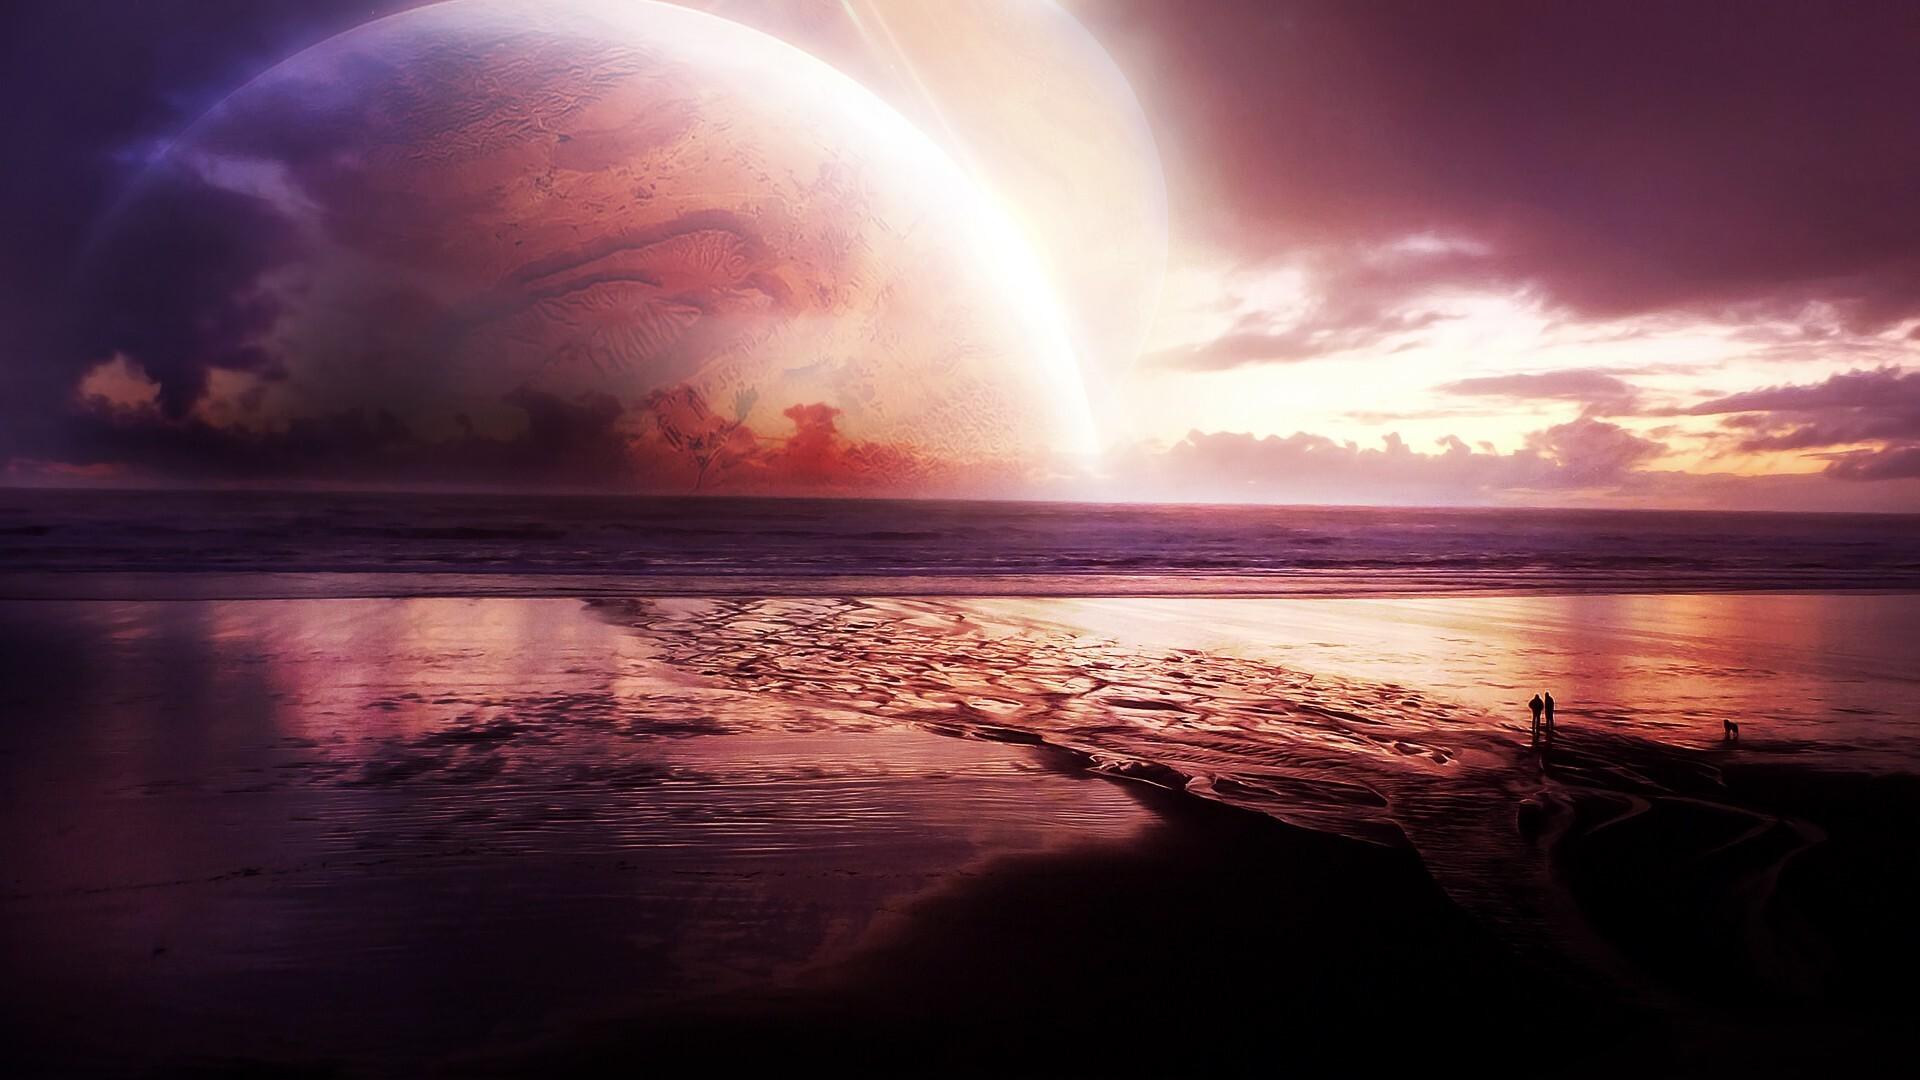 1920x1080 cosmos sunset sea laptop full hd 1080p hd 4k wallpapers